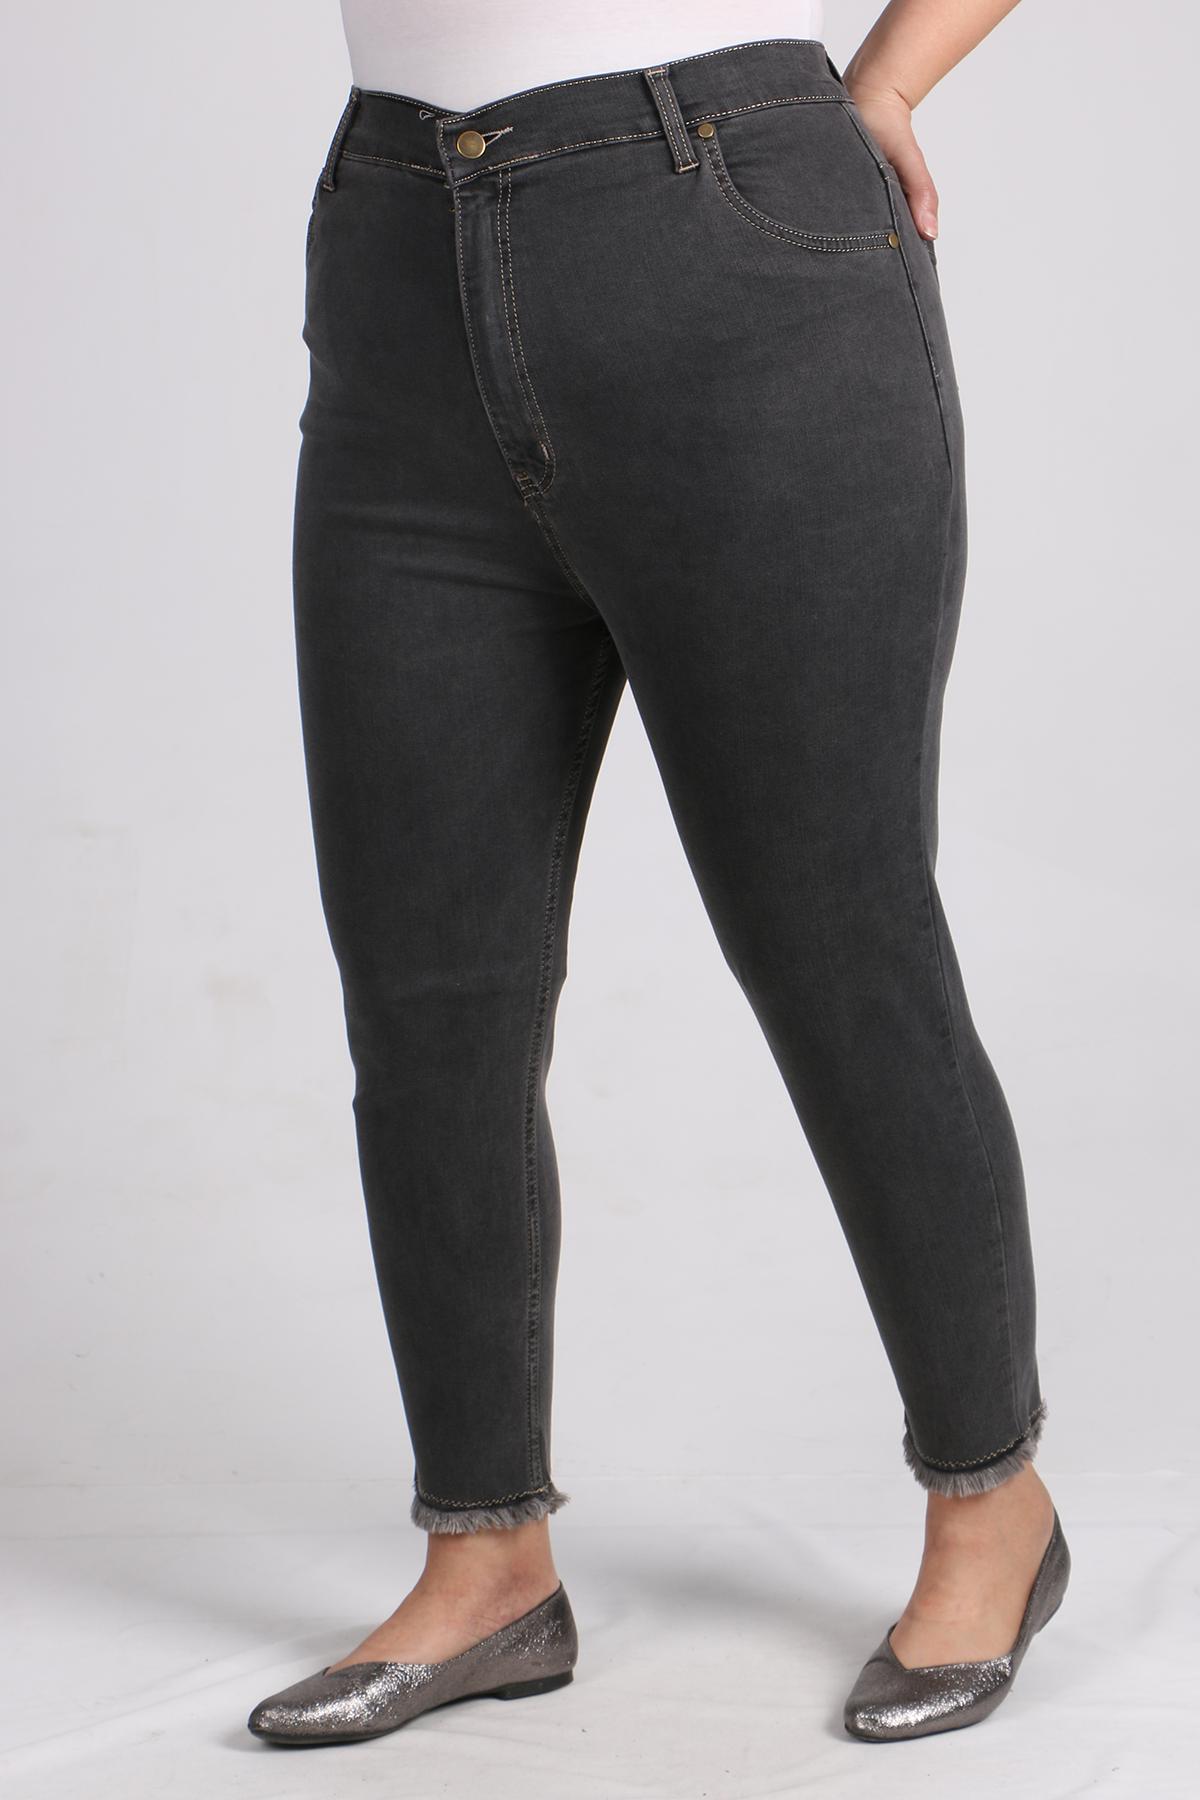 9112 Plus Size Skinny Leg Jeans - Anthracite